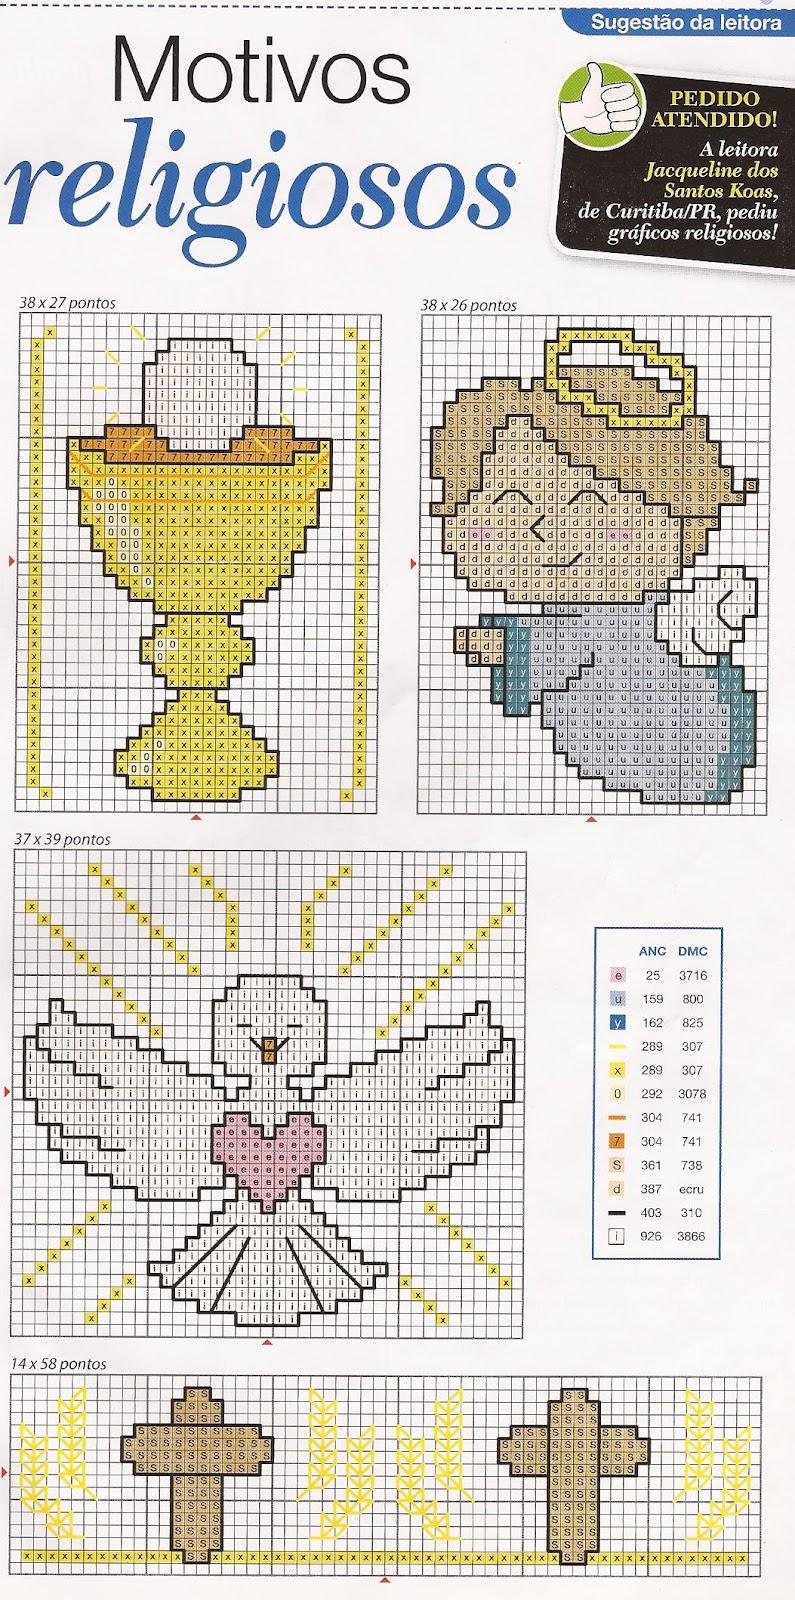 Punto de cruz para imprimir gratis ninos com portal - Motivos en punto de cruz ...